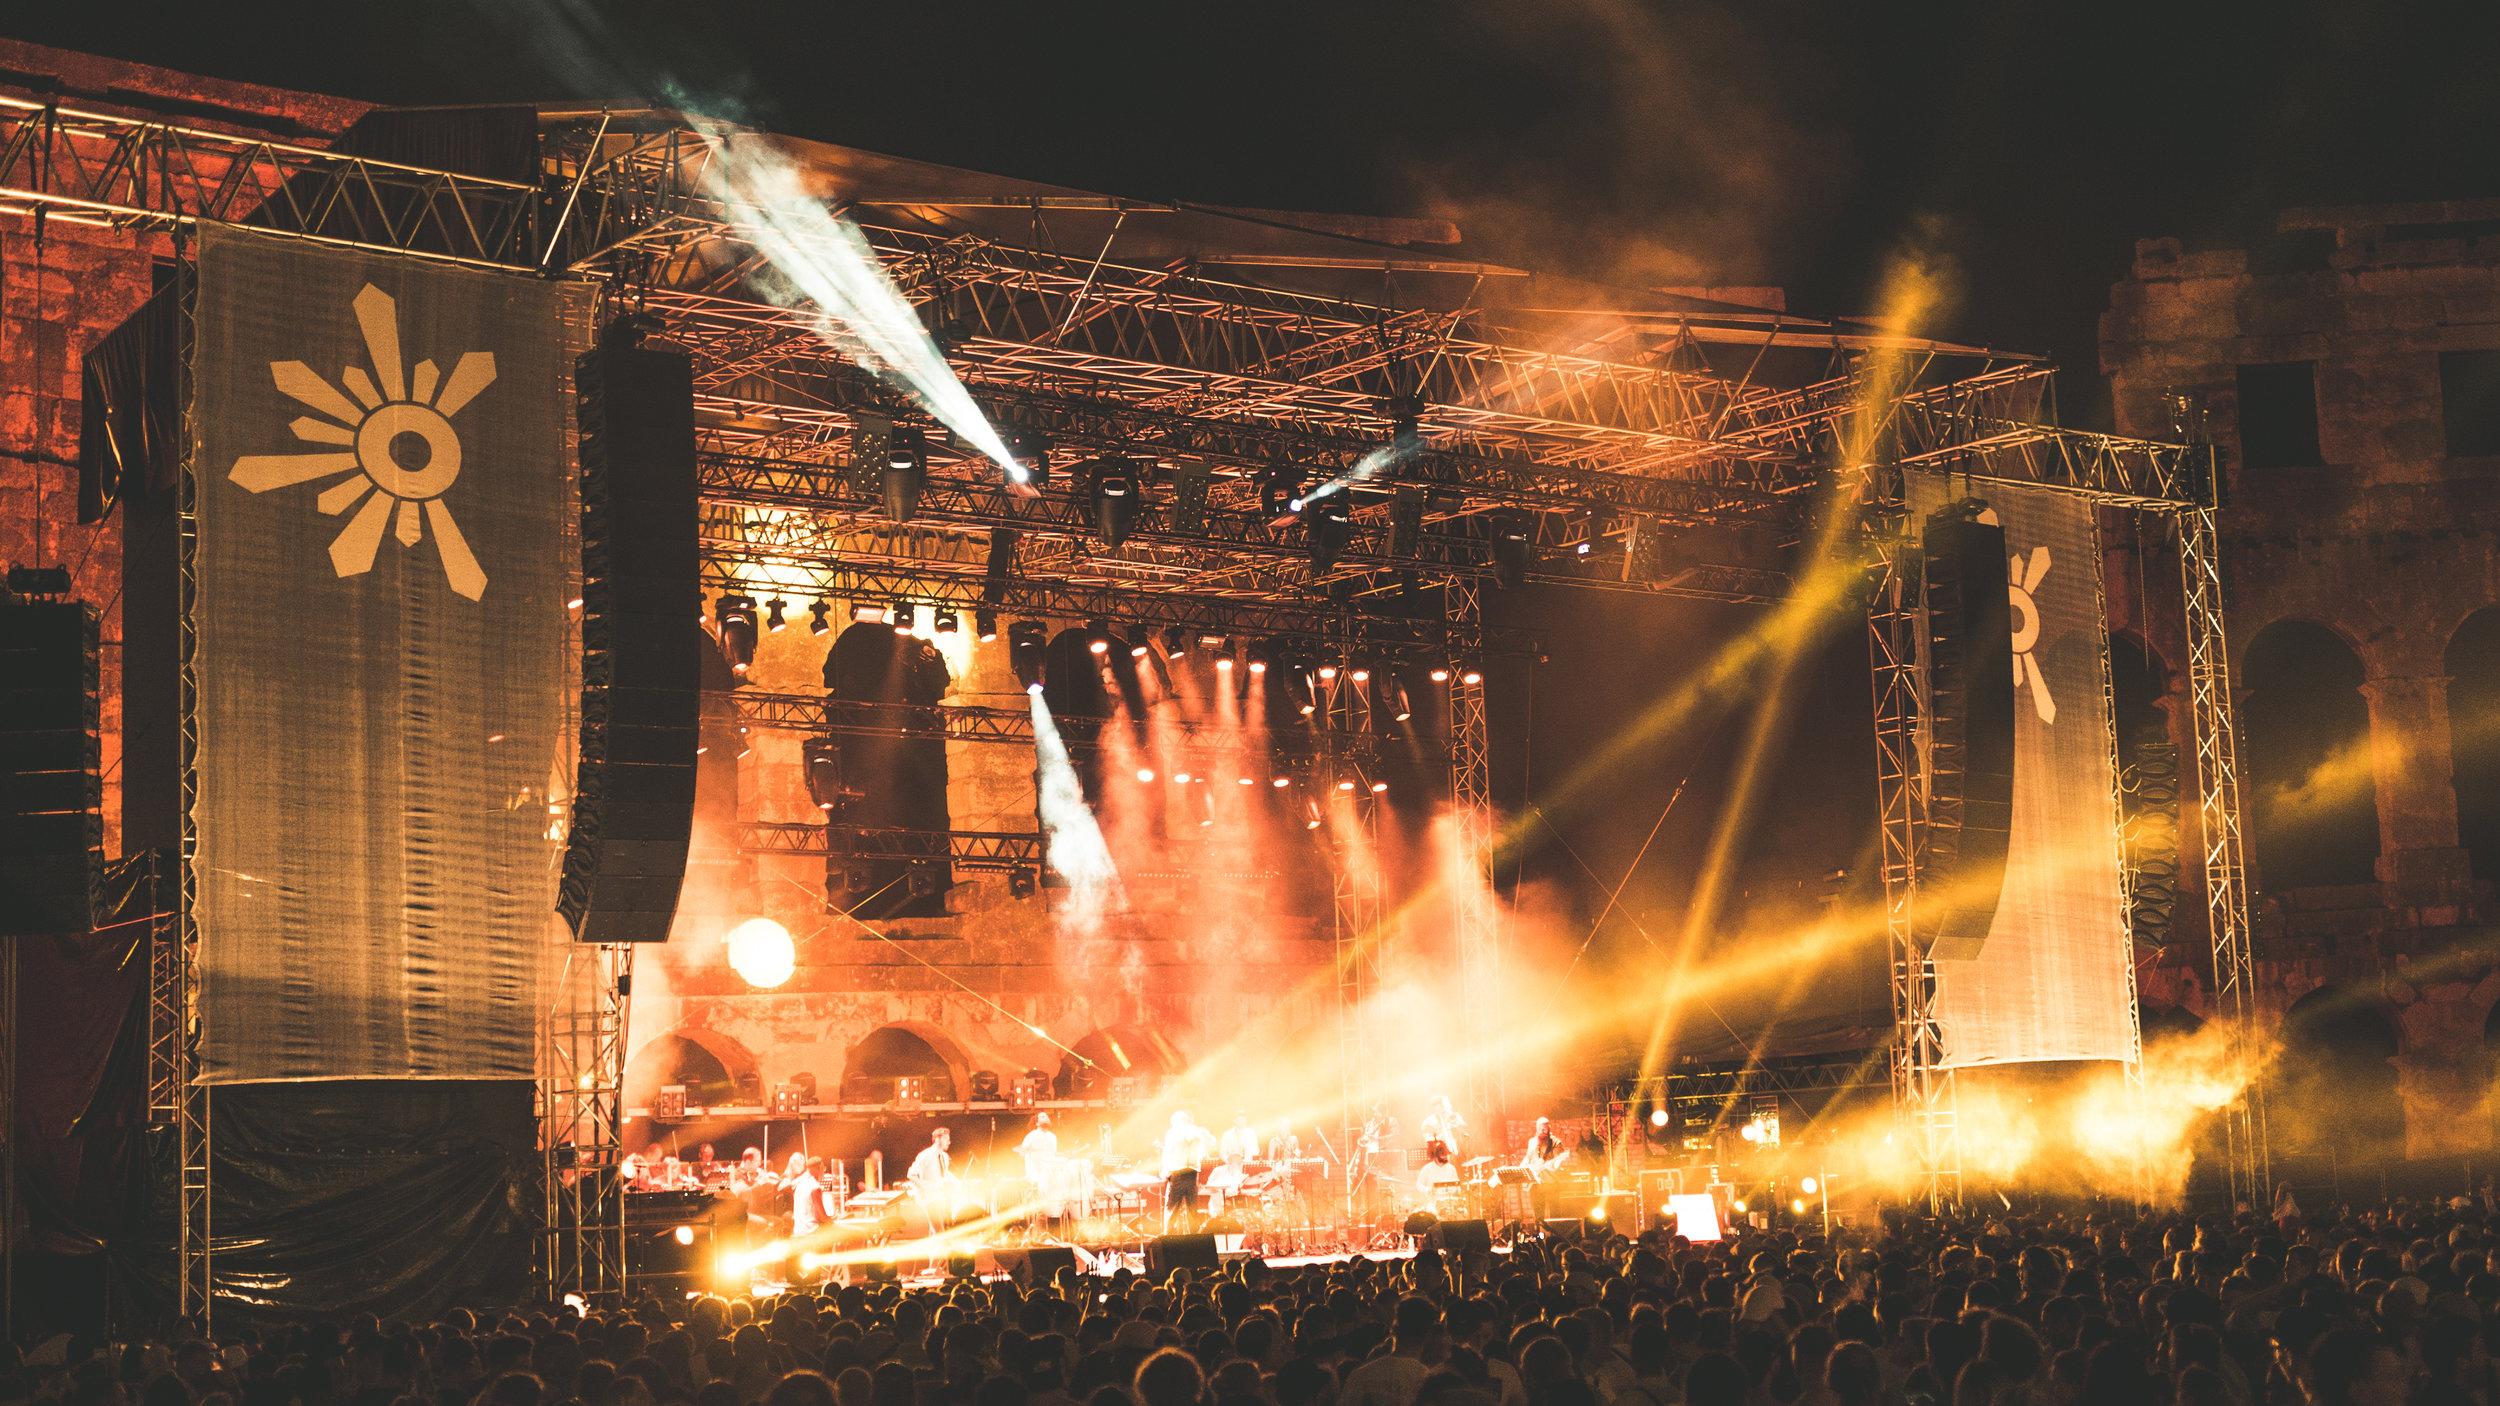 Outlook Festival 2017. Photo by Callum Chaplin